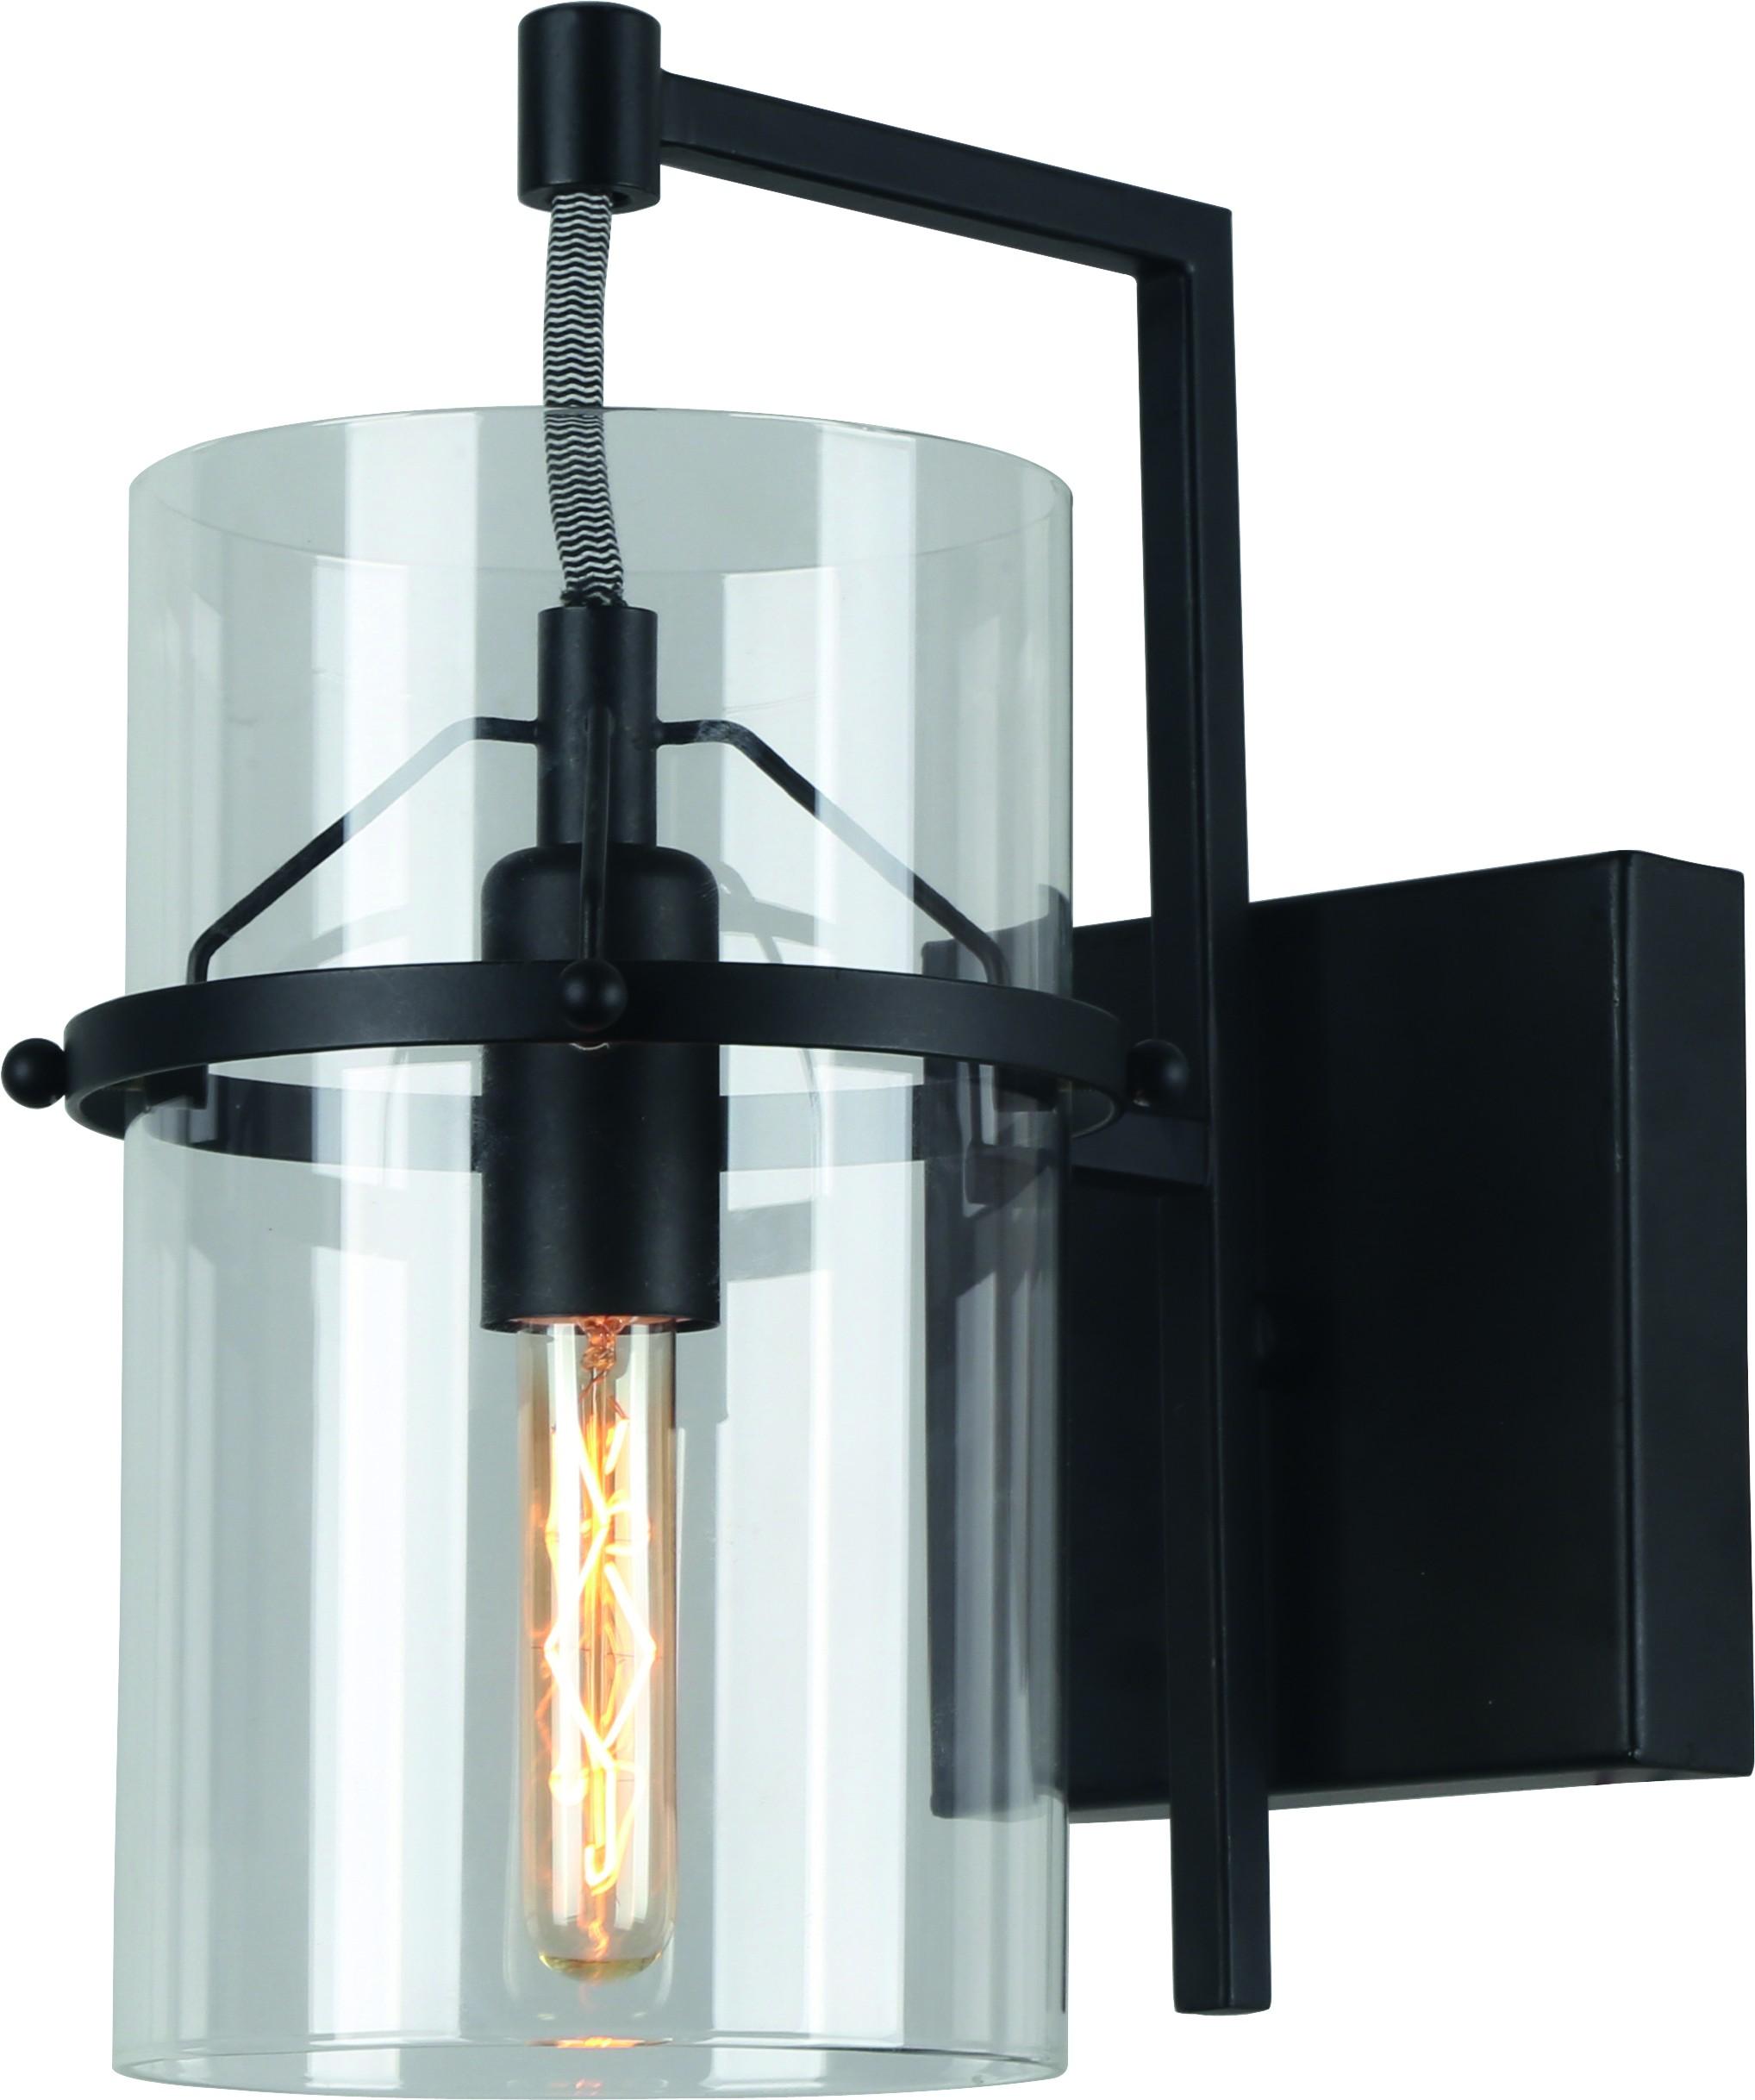 Бра Arte lamp A8586ap-1bk